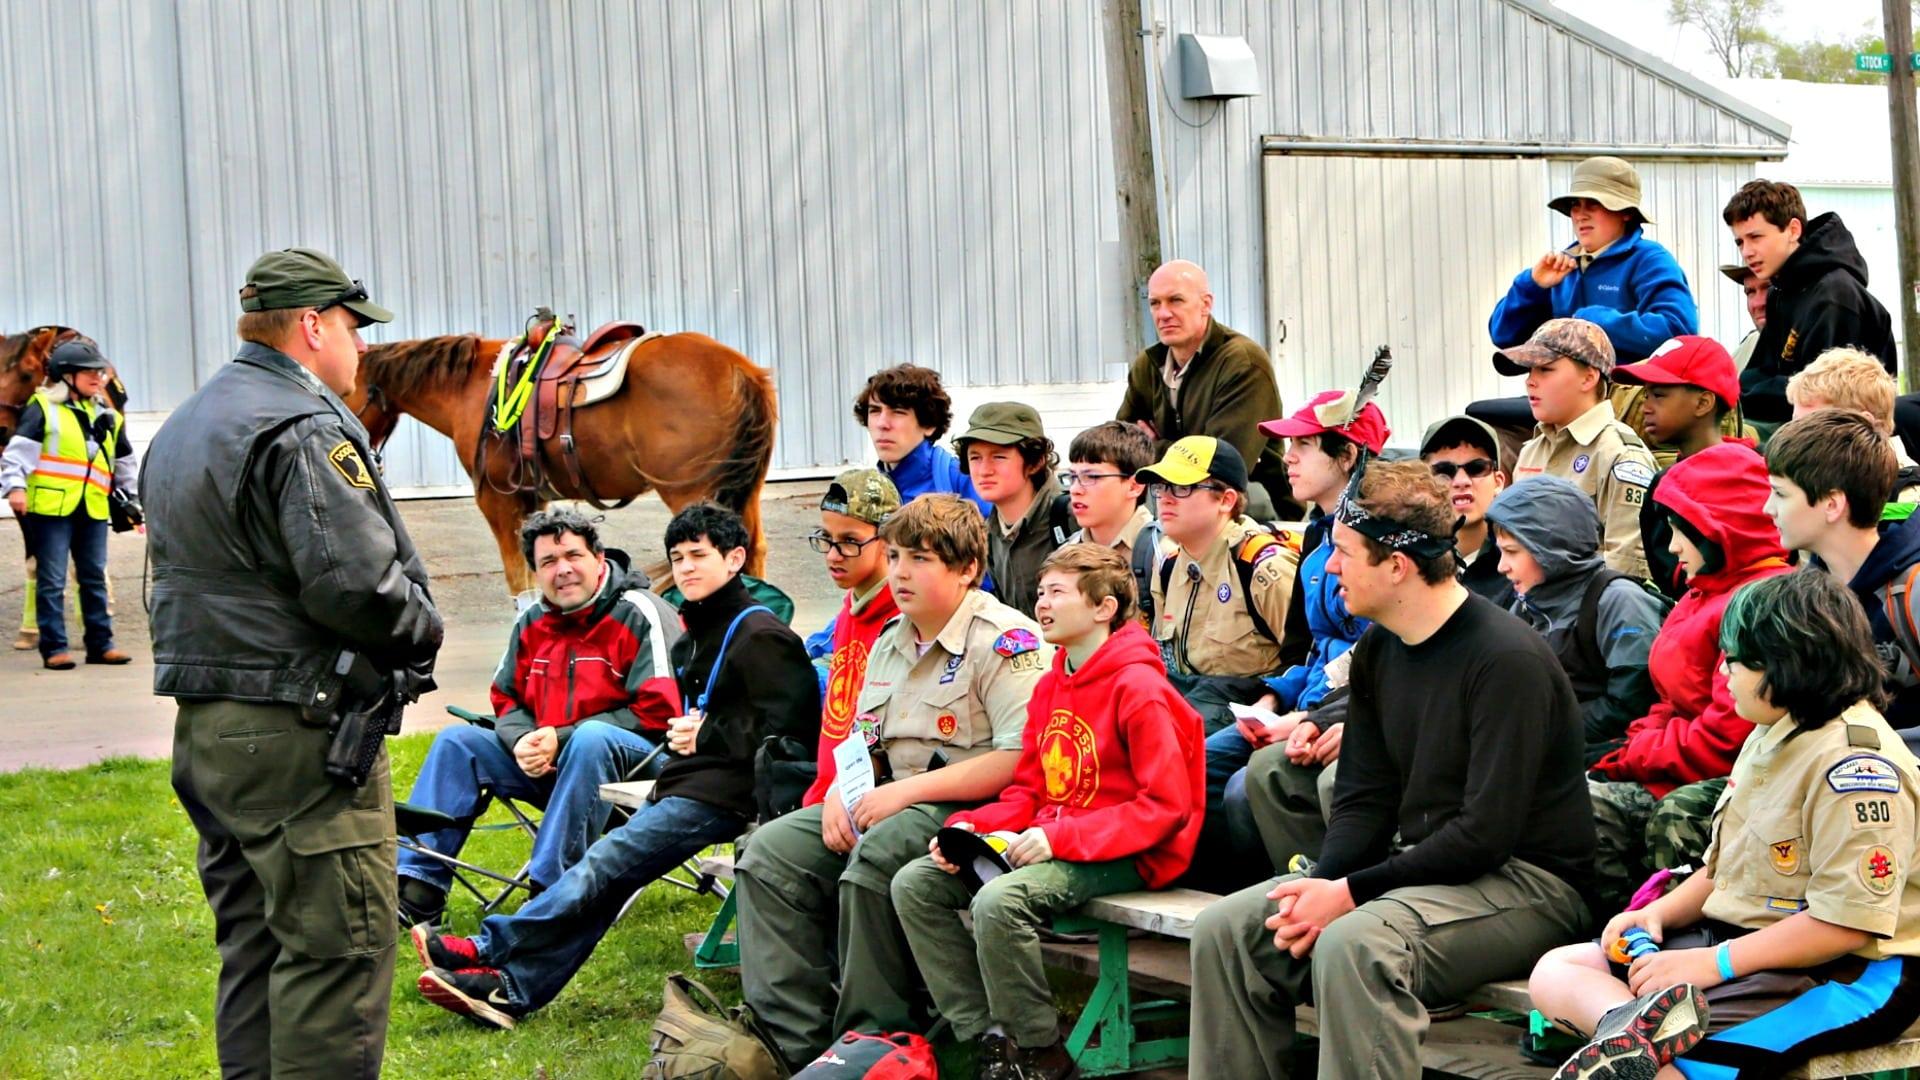 Boy Scout Spring Camporee Dodge County Sheriff Seminars